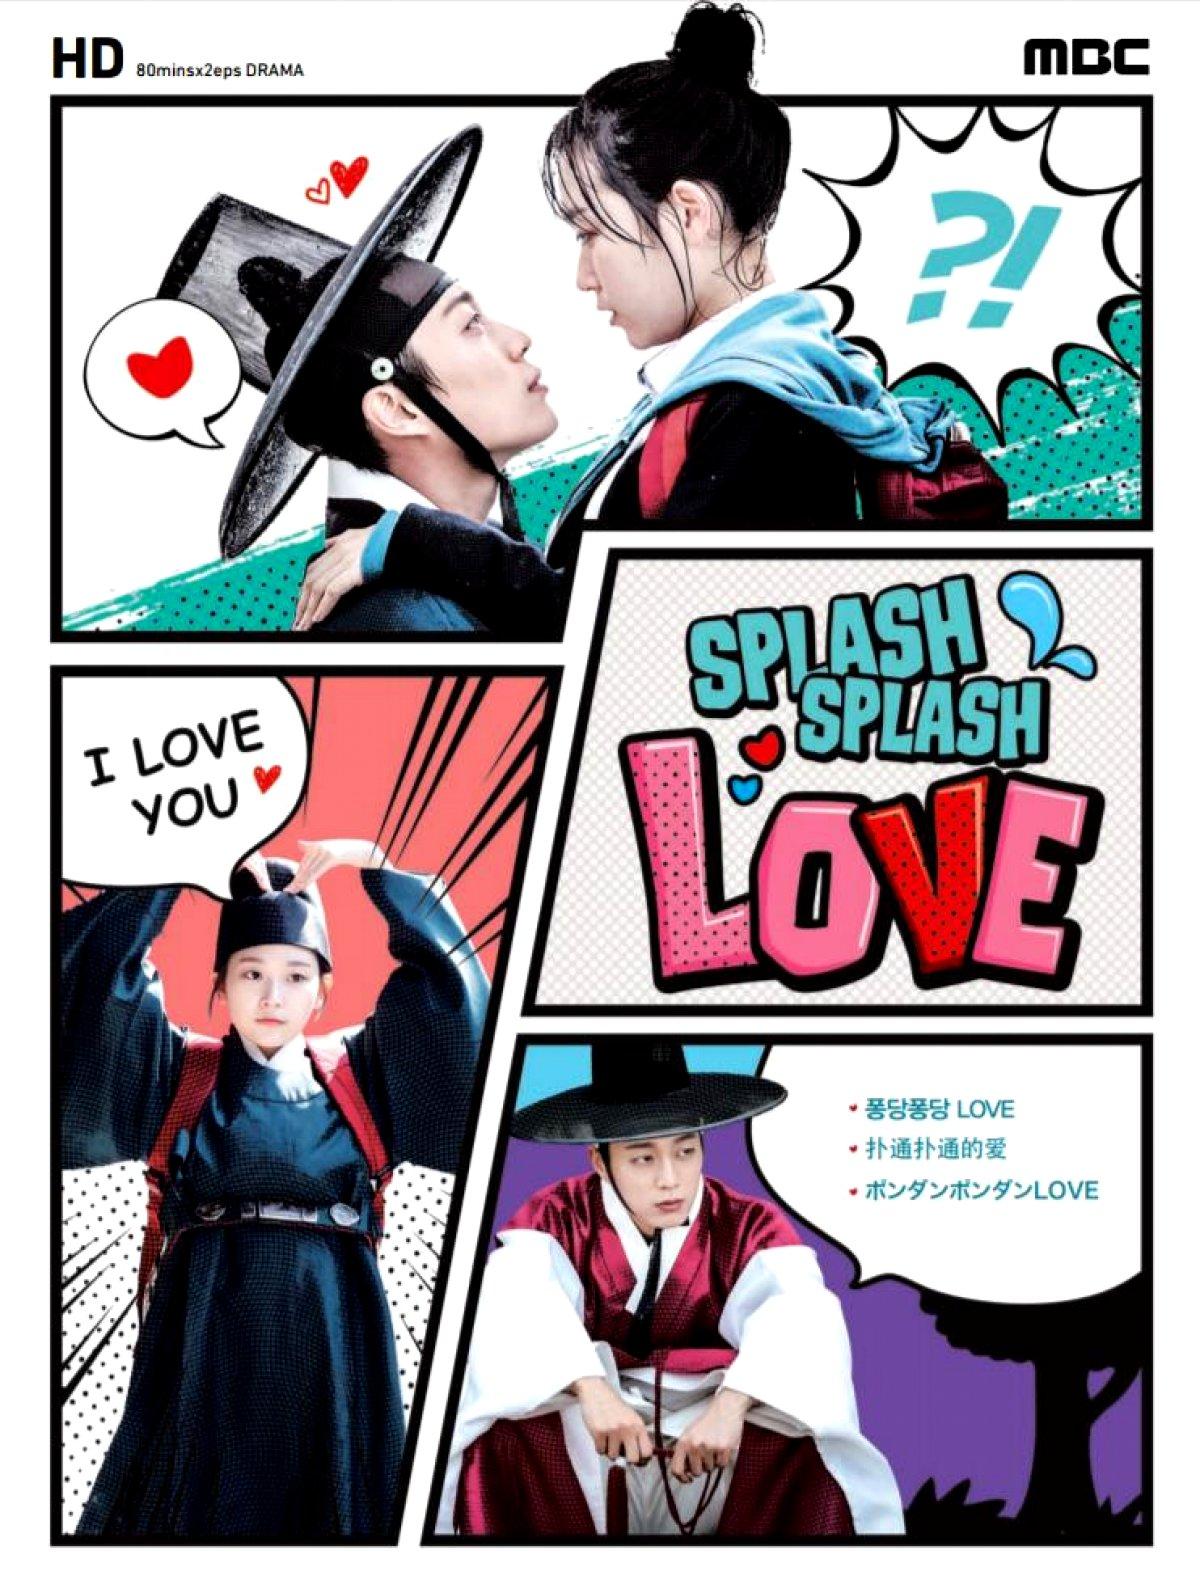 مینی سریال کره ای شالاپ شلوپ عشق 2015 Splash Splash Love